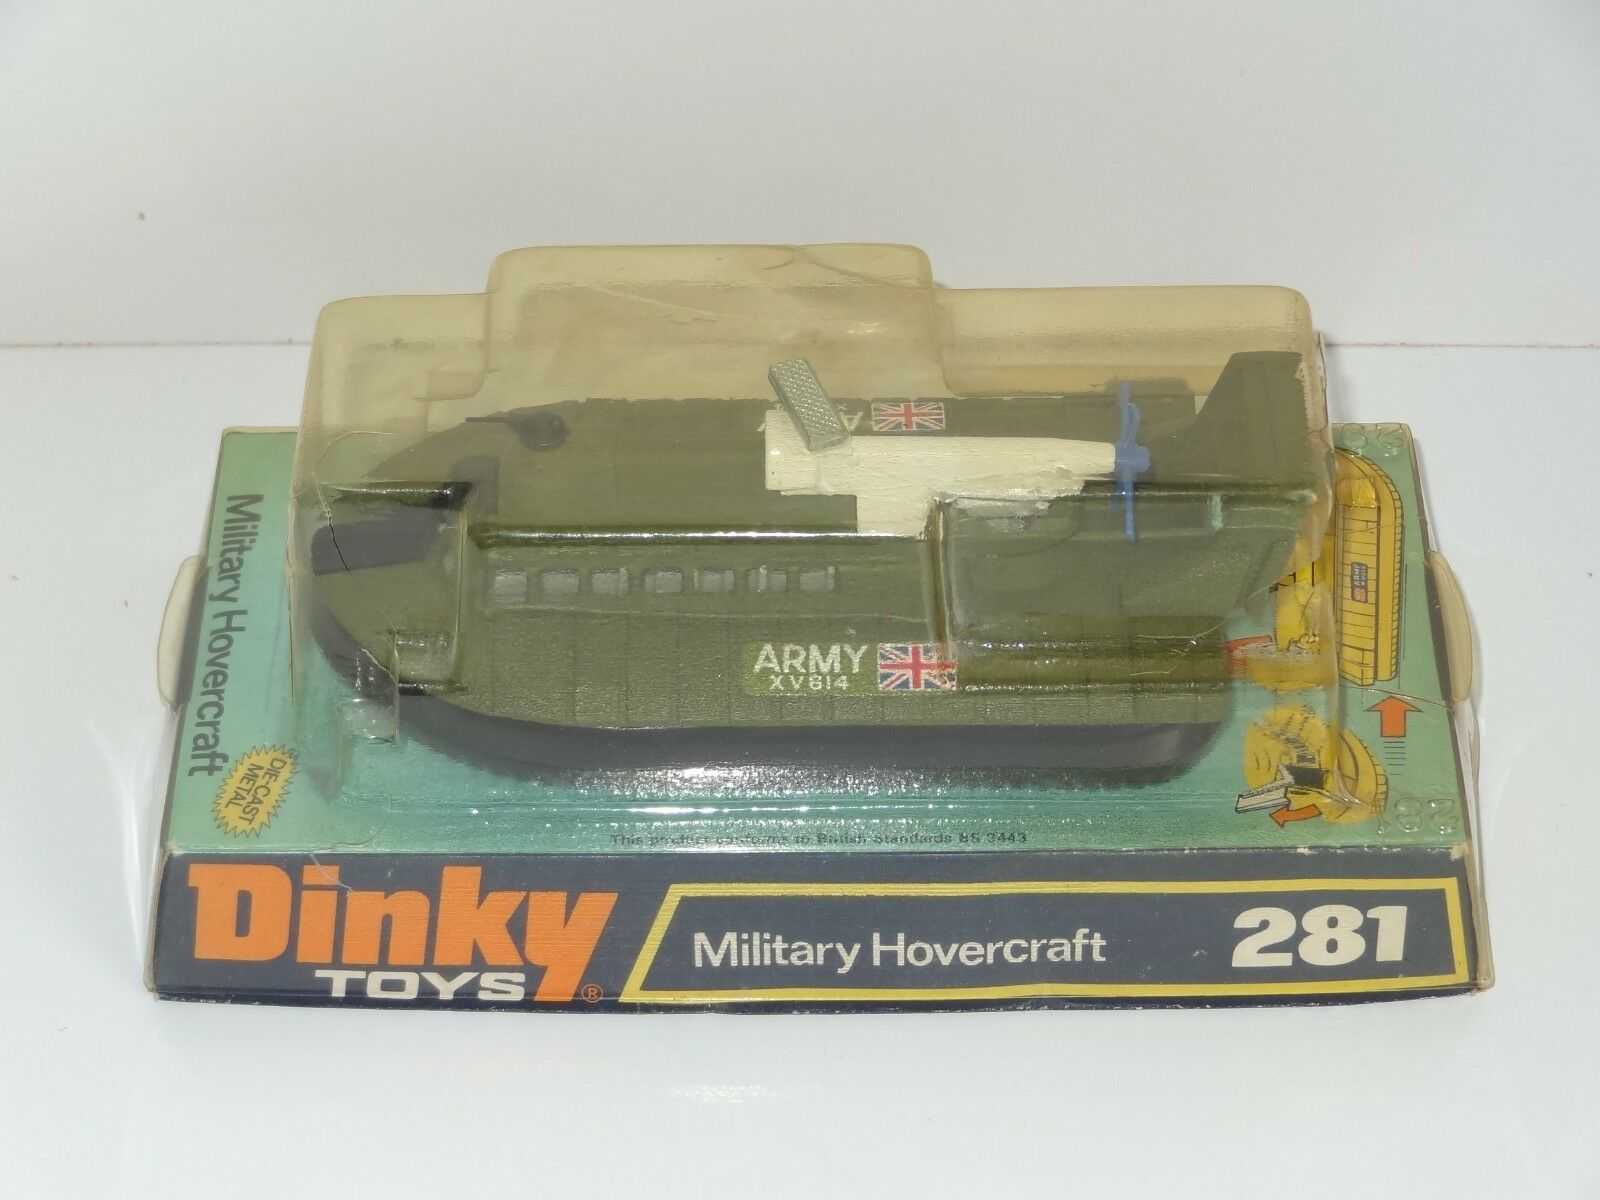 (KB) Dinky MILITARY ARMY HOVERCRAFT - 281